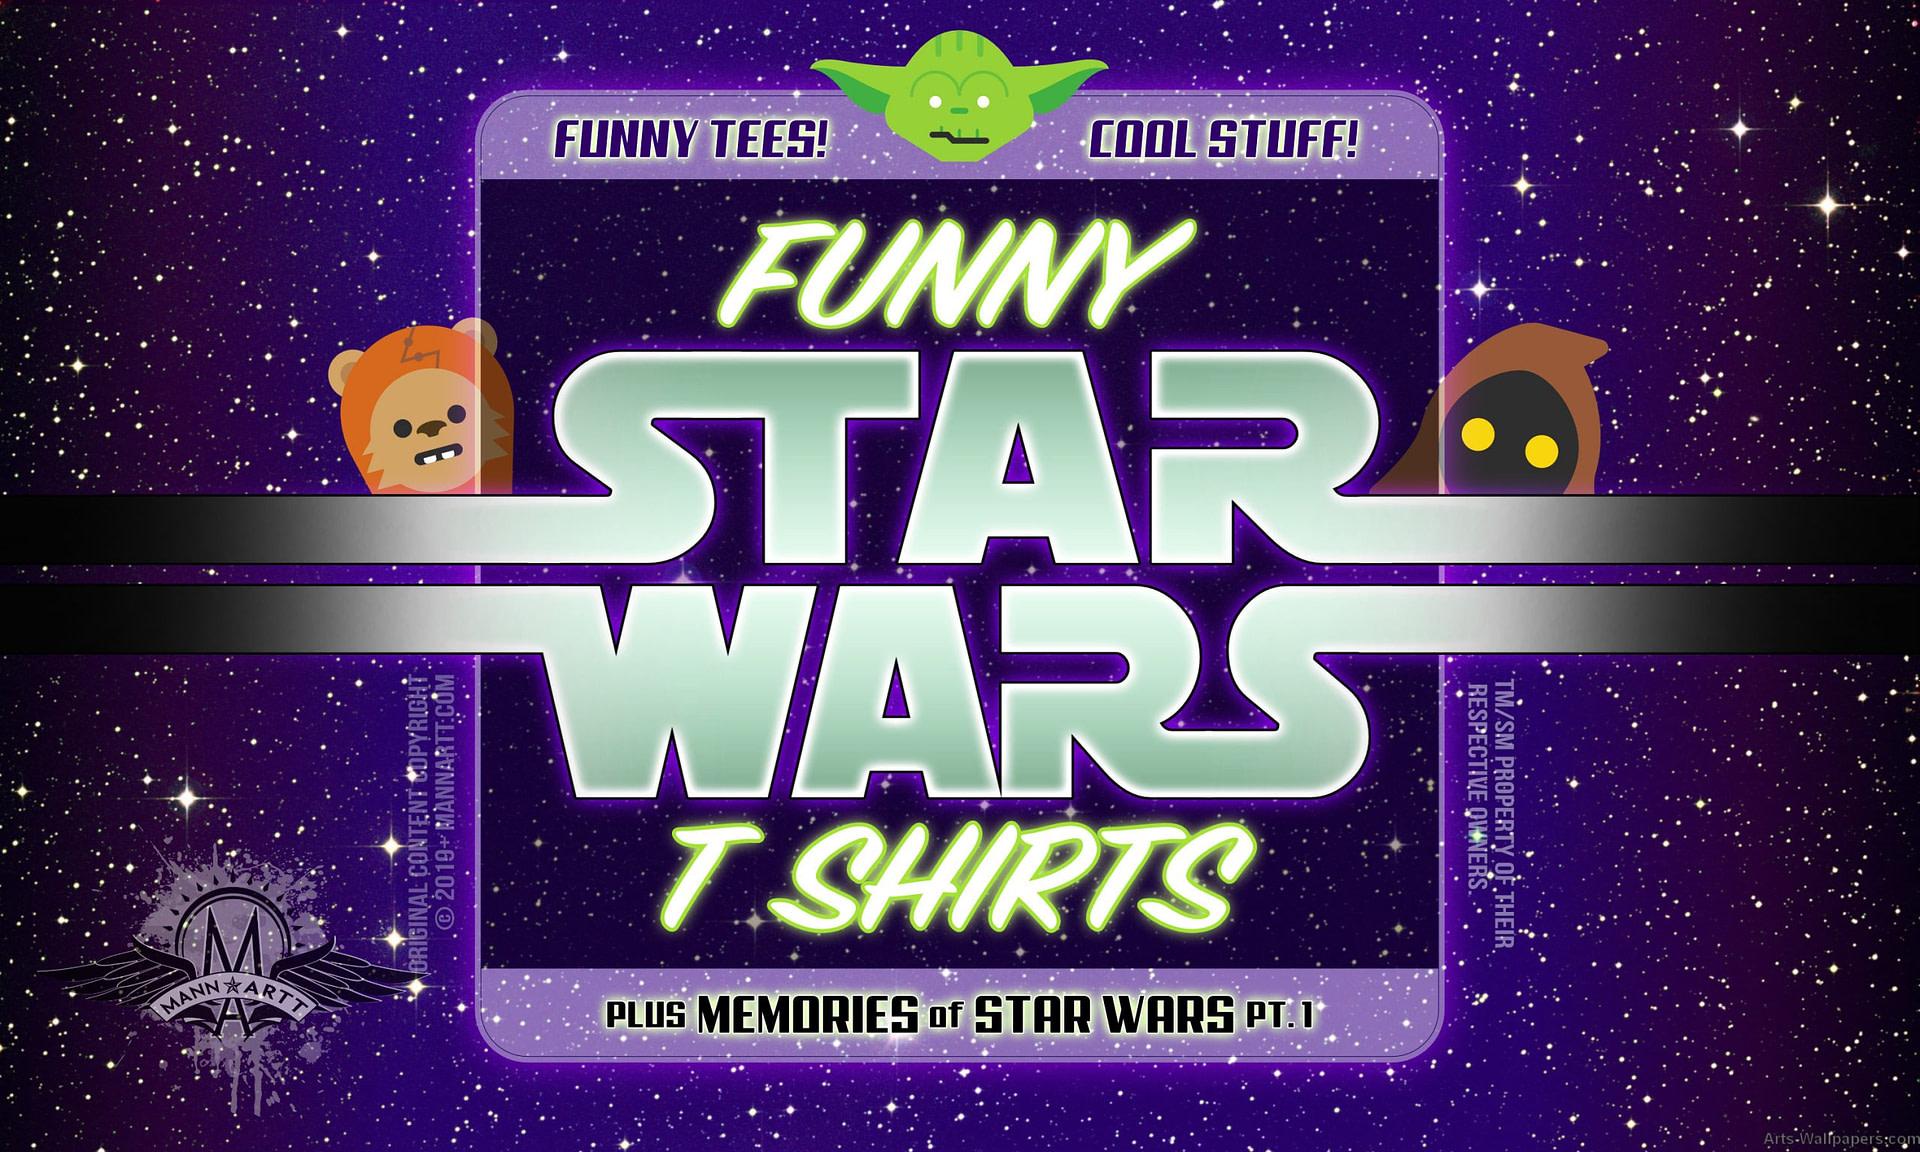 Funny Star Wars Shirts & Tees for Men, Women & Kids | Memories of Star Wars 1